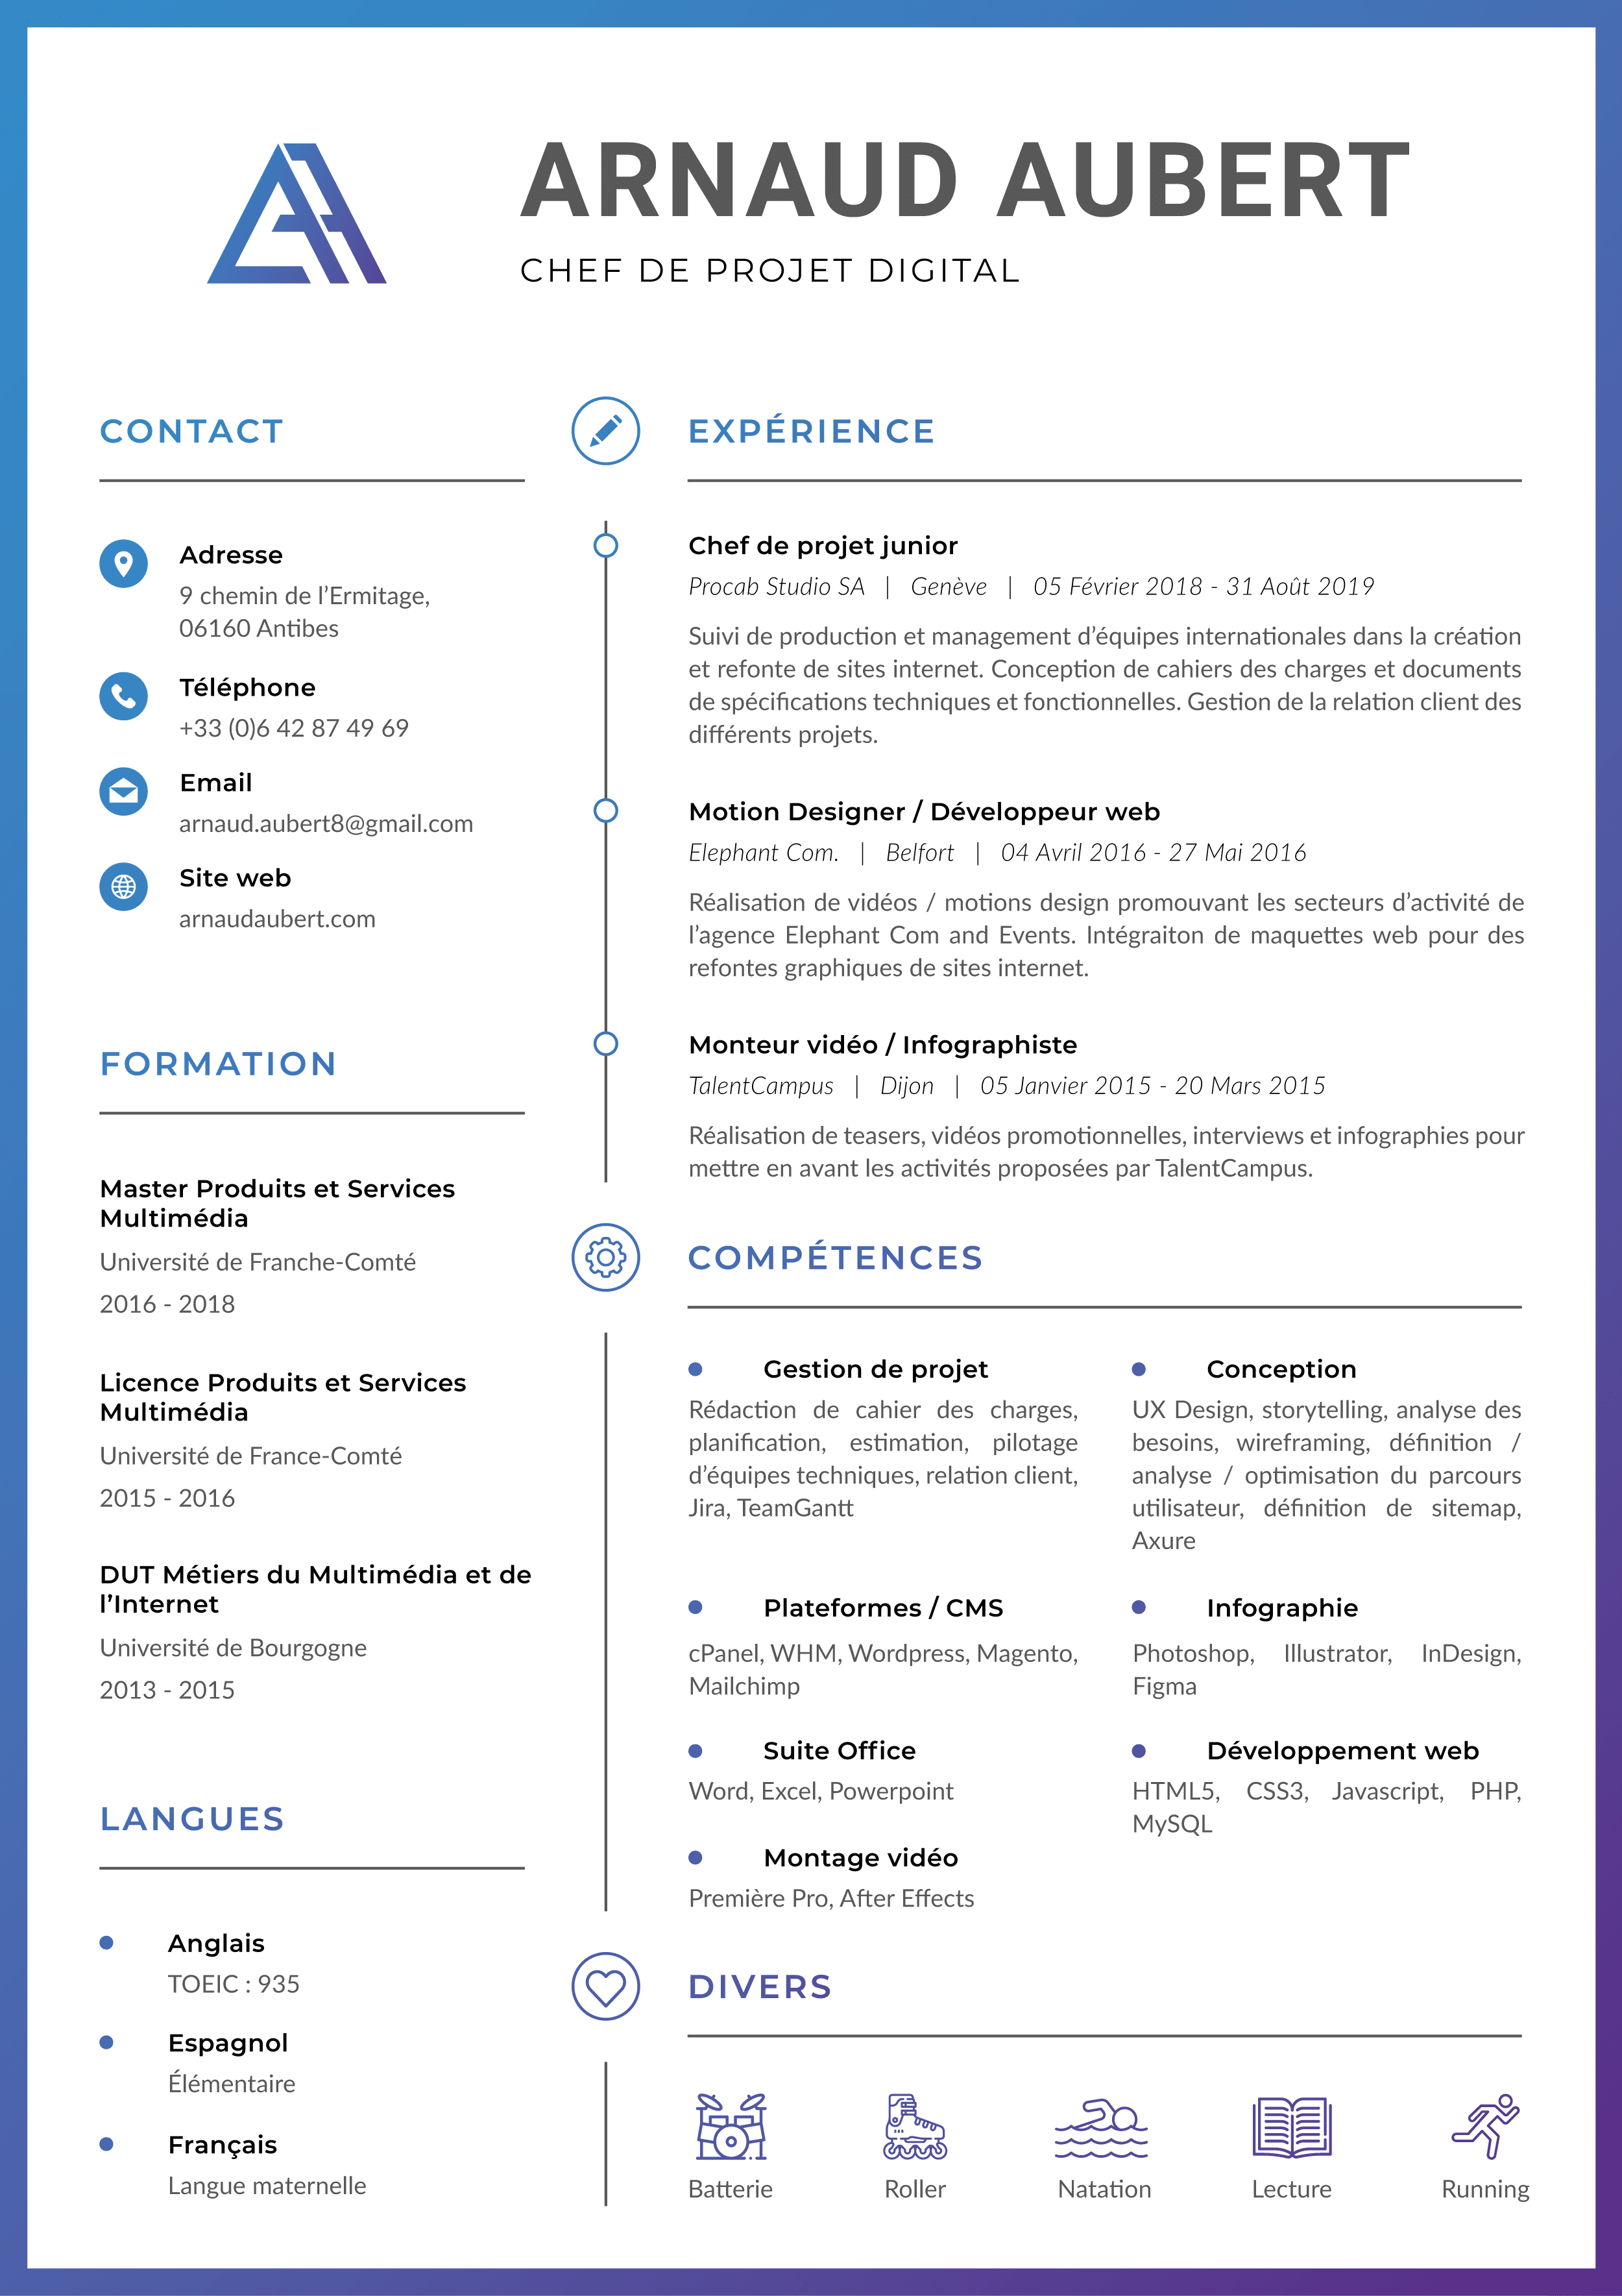 CV arnaud aubert 2020